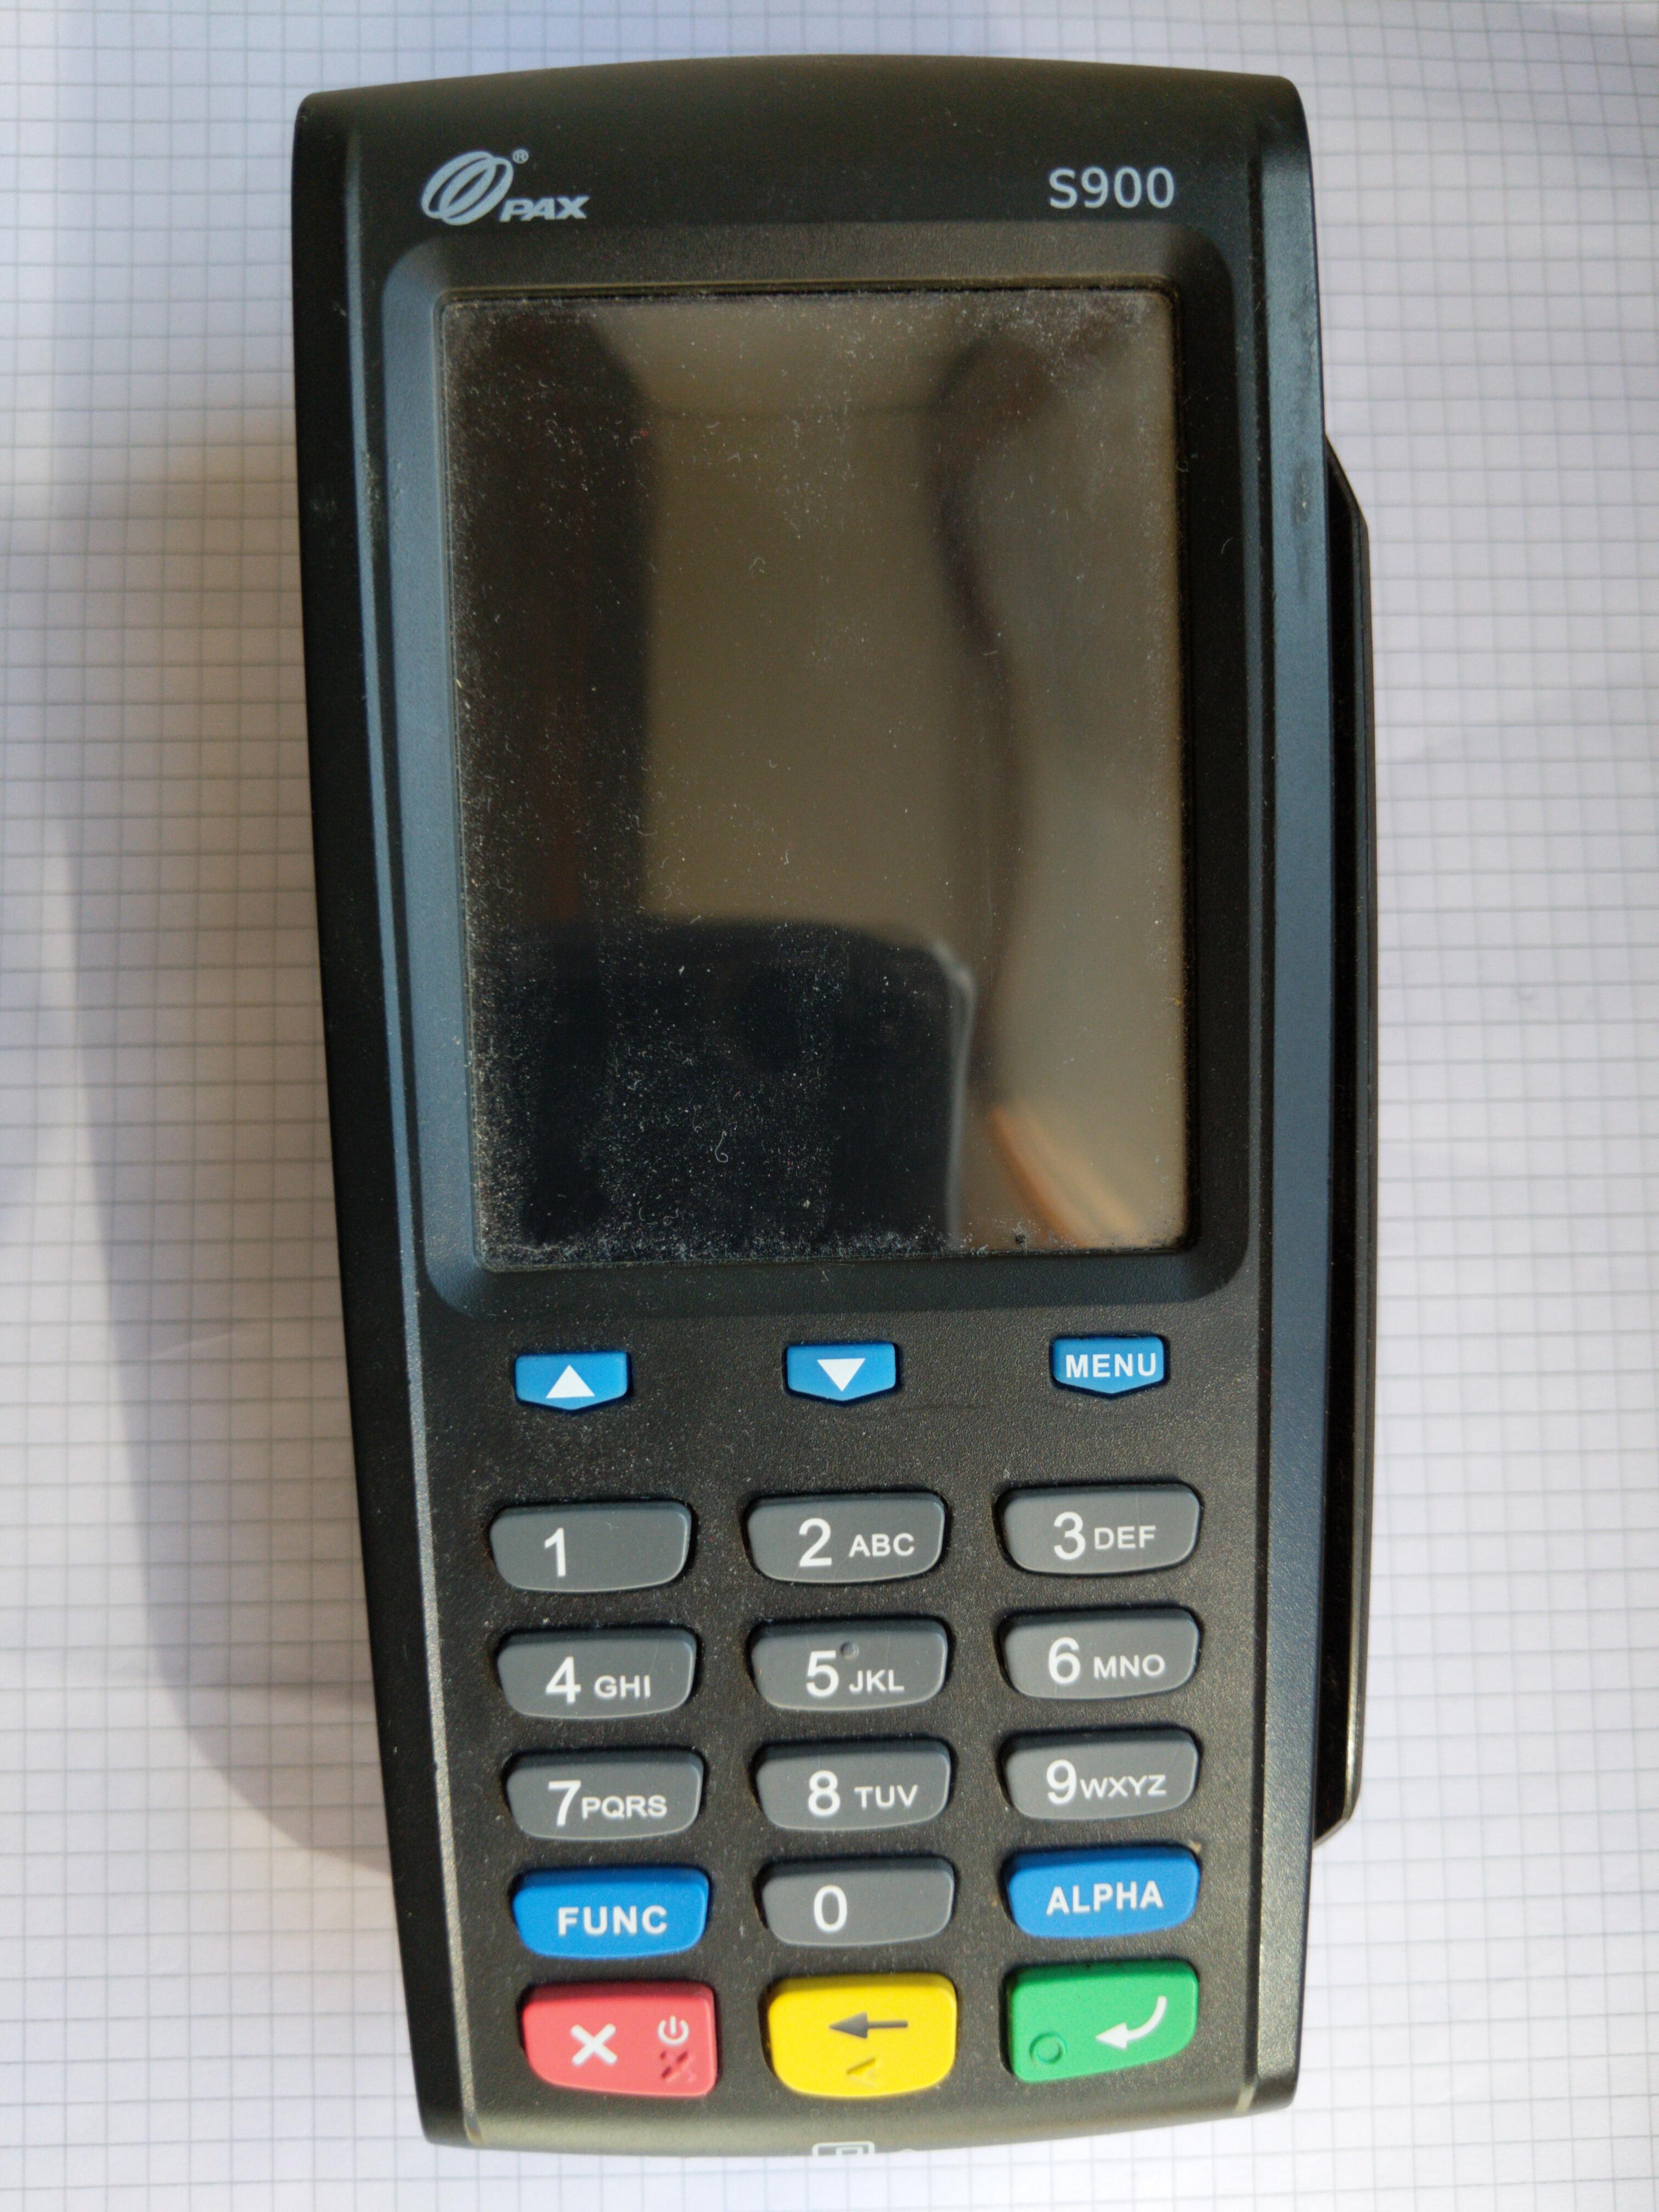 PAX S900 from eBay